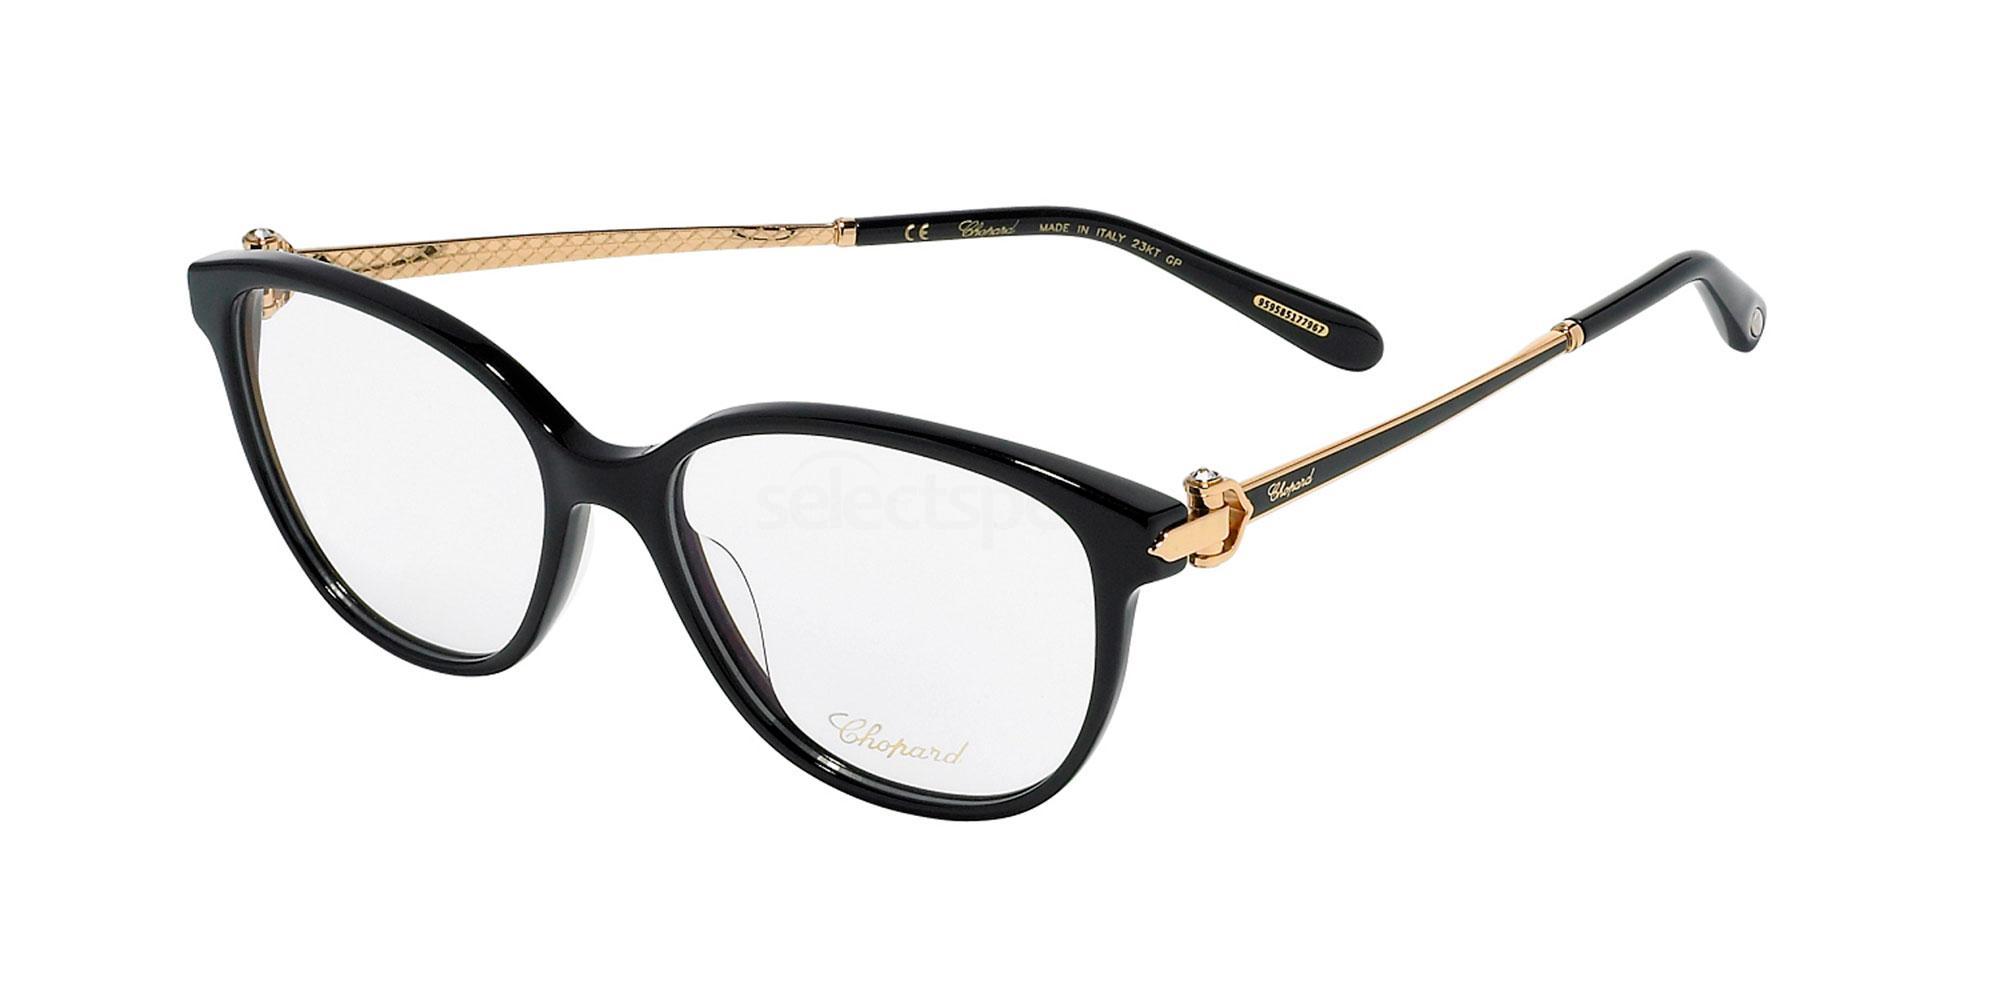 0700 VCH245S Glasses, Chopard